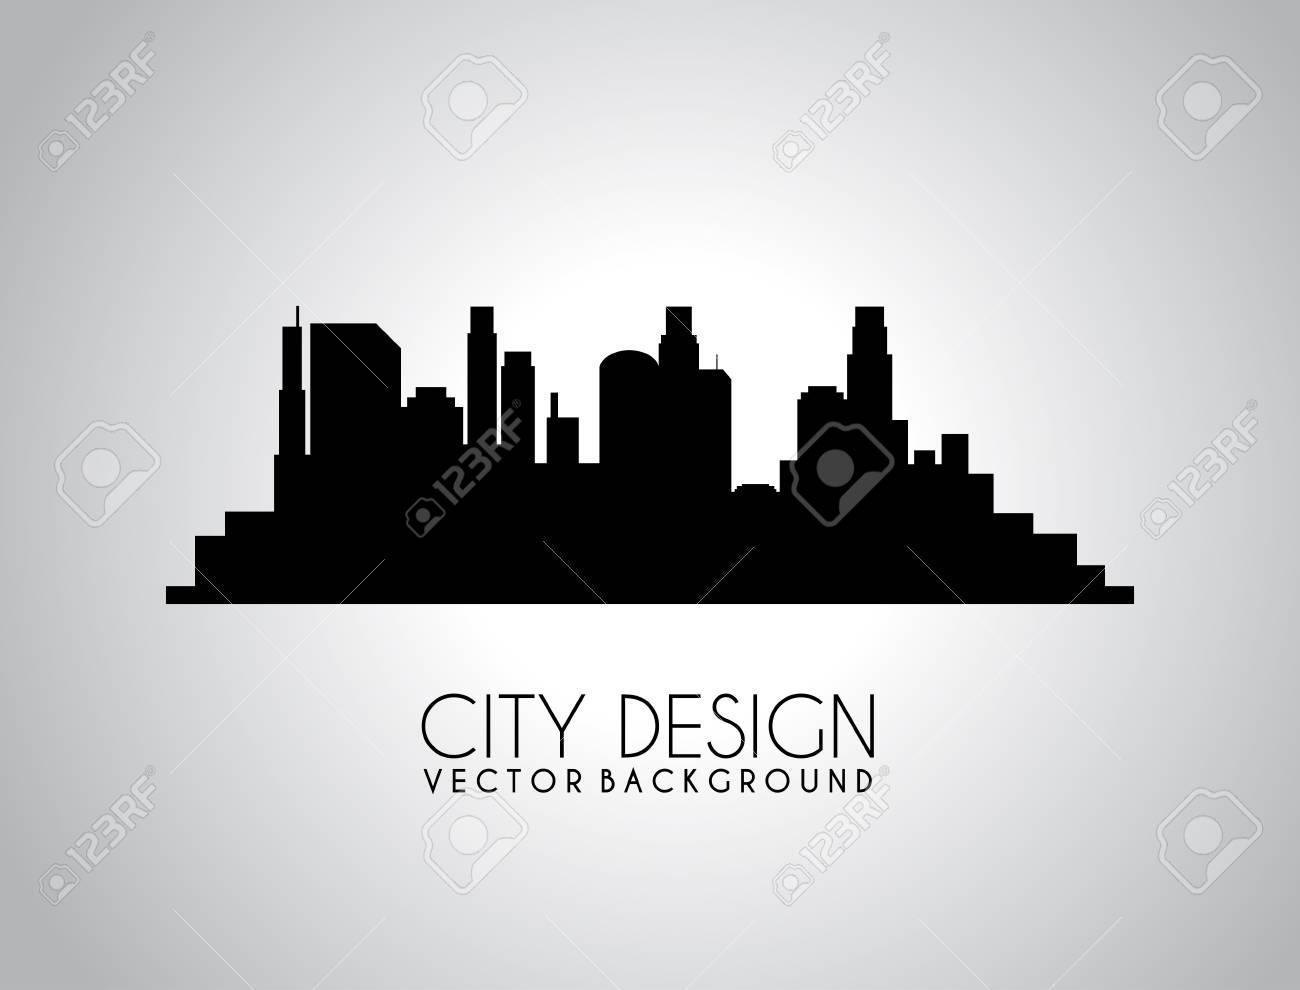 city design over gray background vector illustration Stock Vector - 20107851